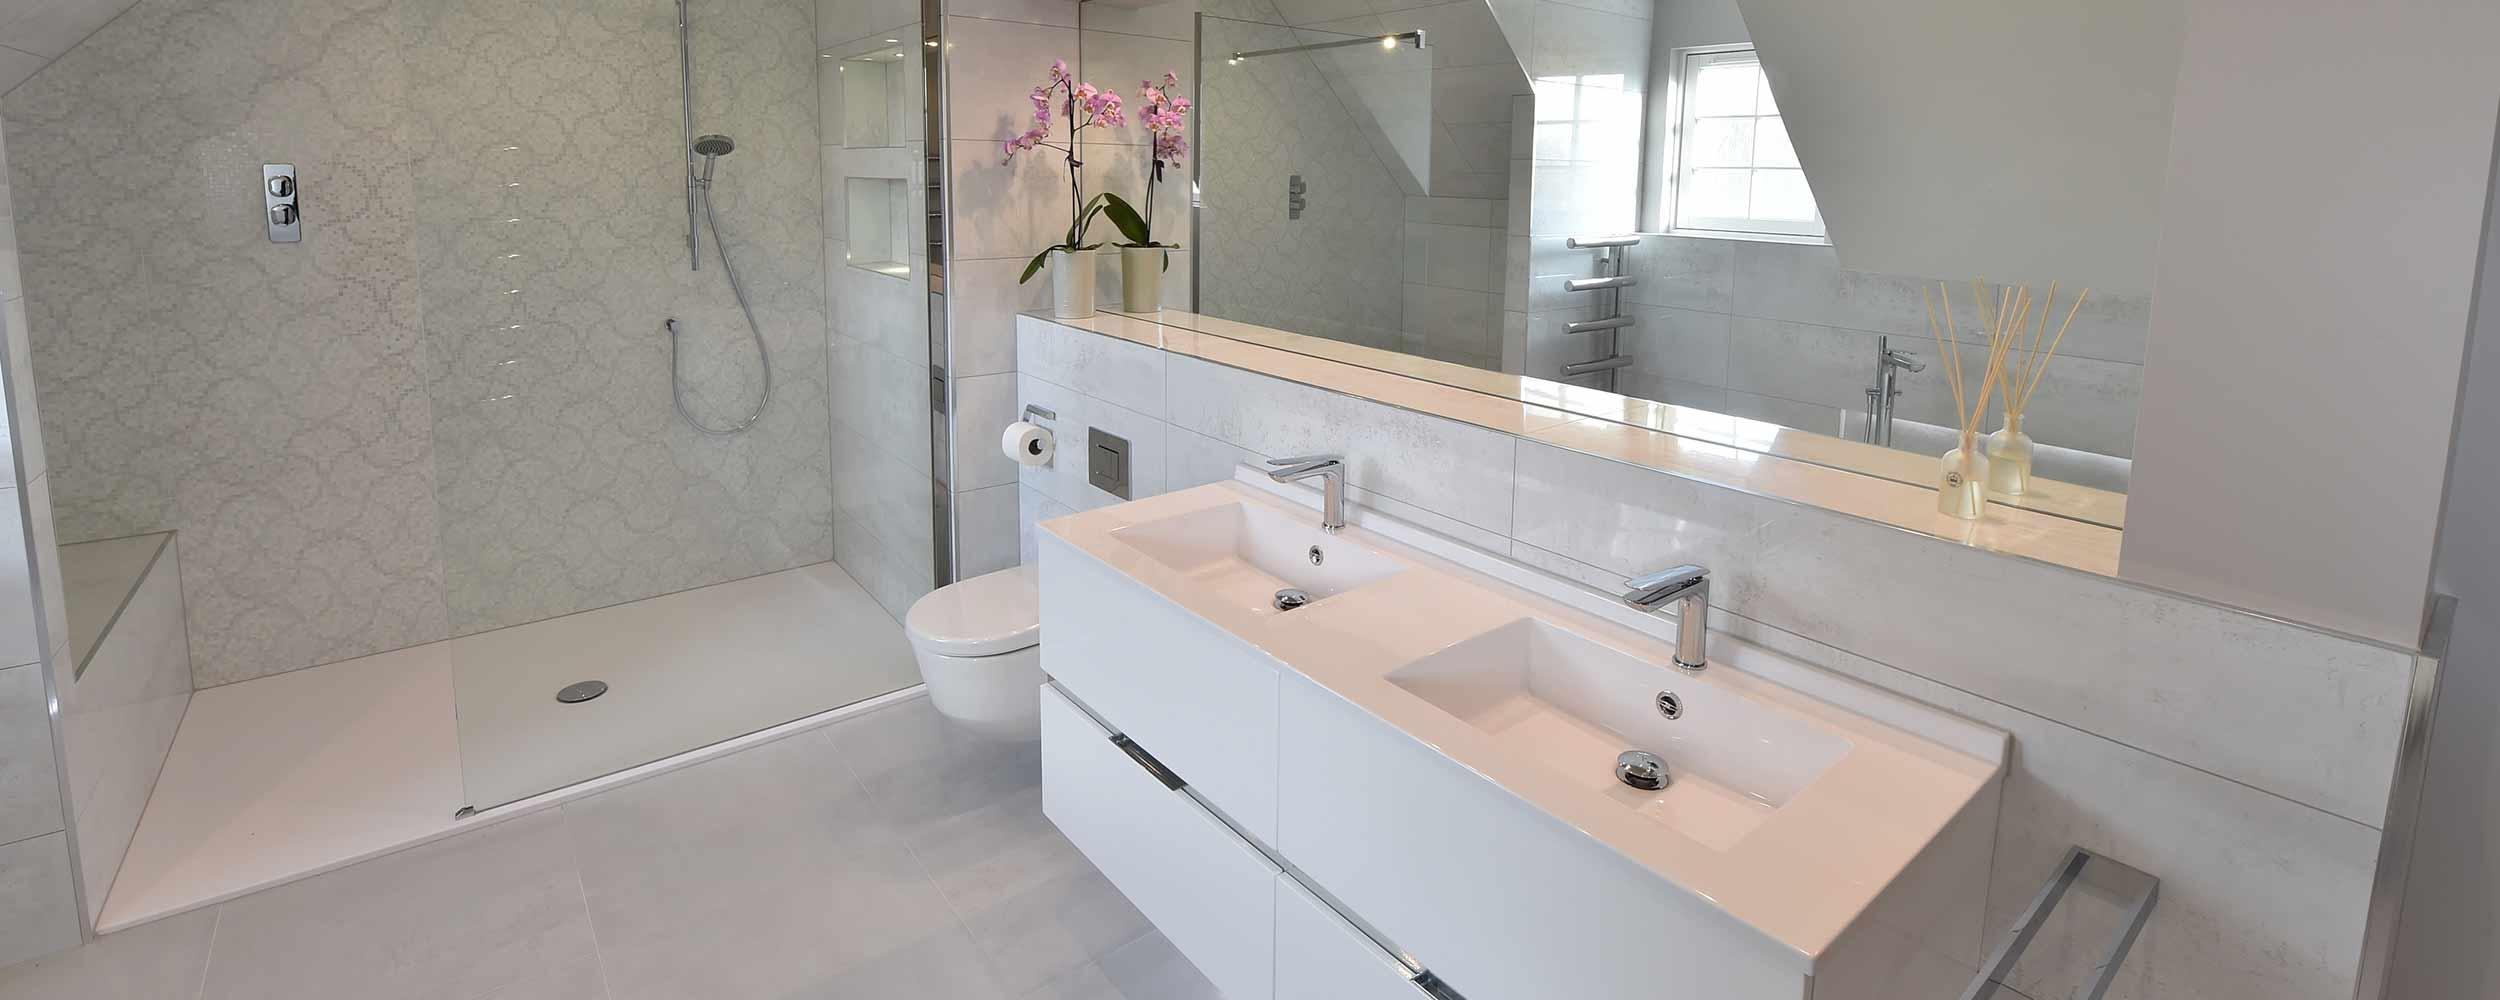 bathrooms dunfermline